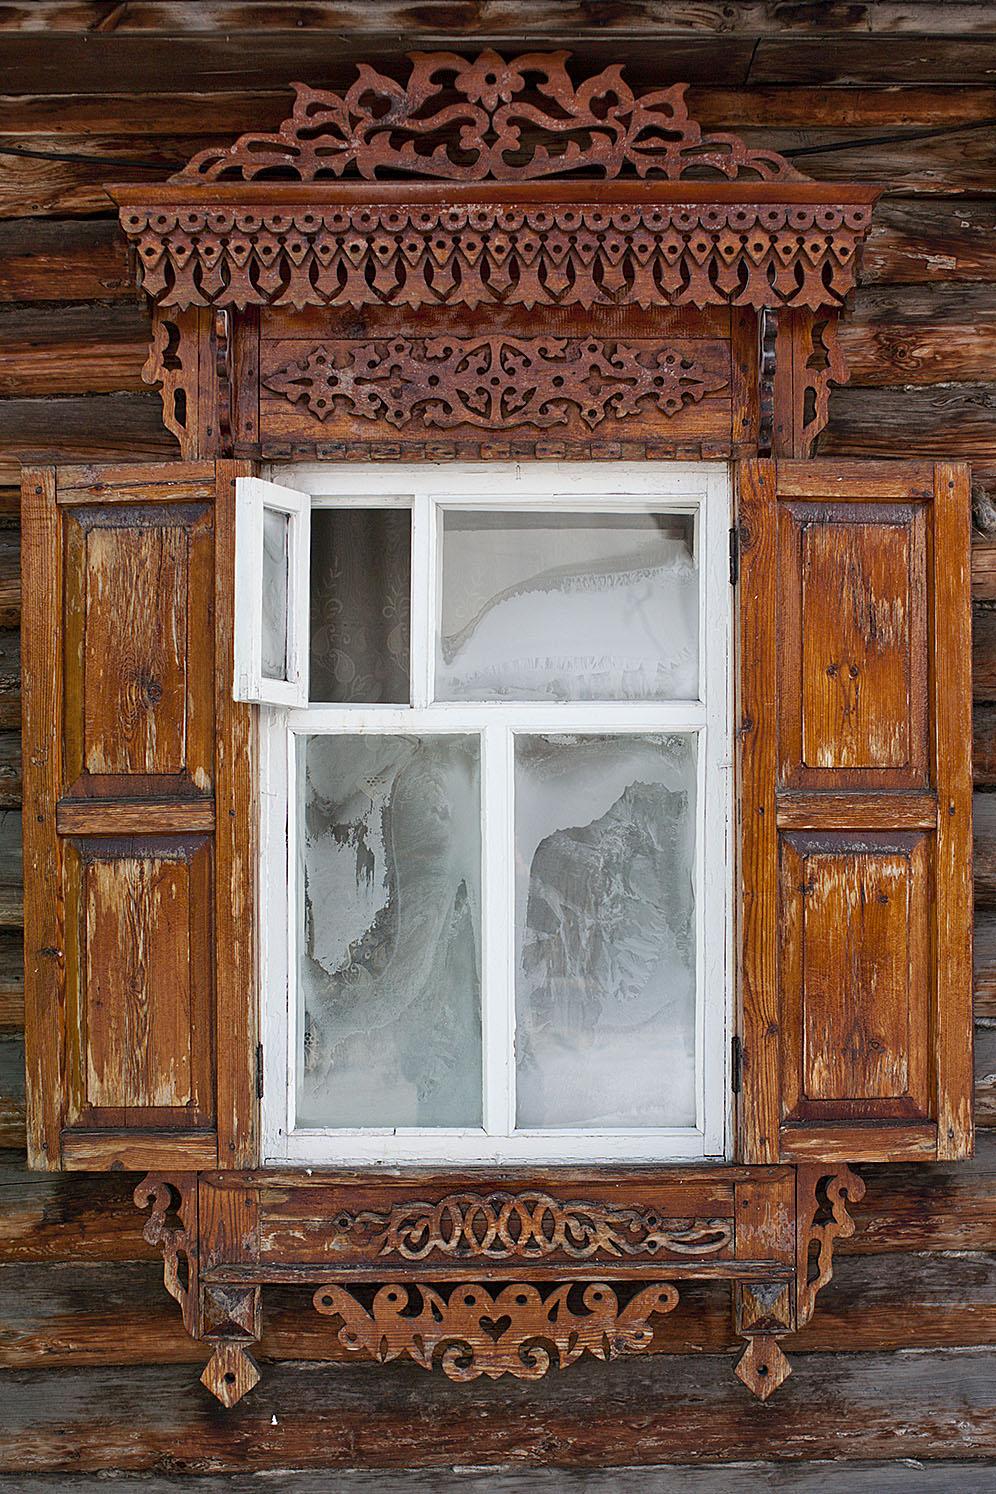 Старинная резьба на окне